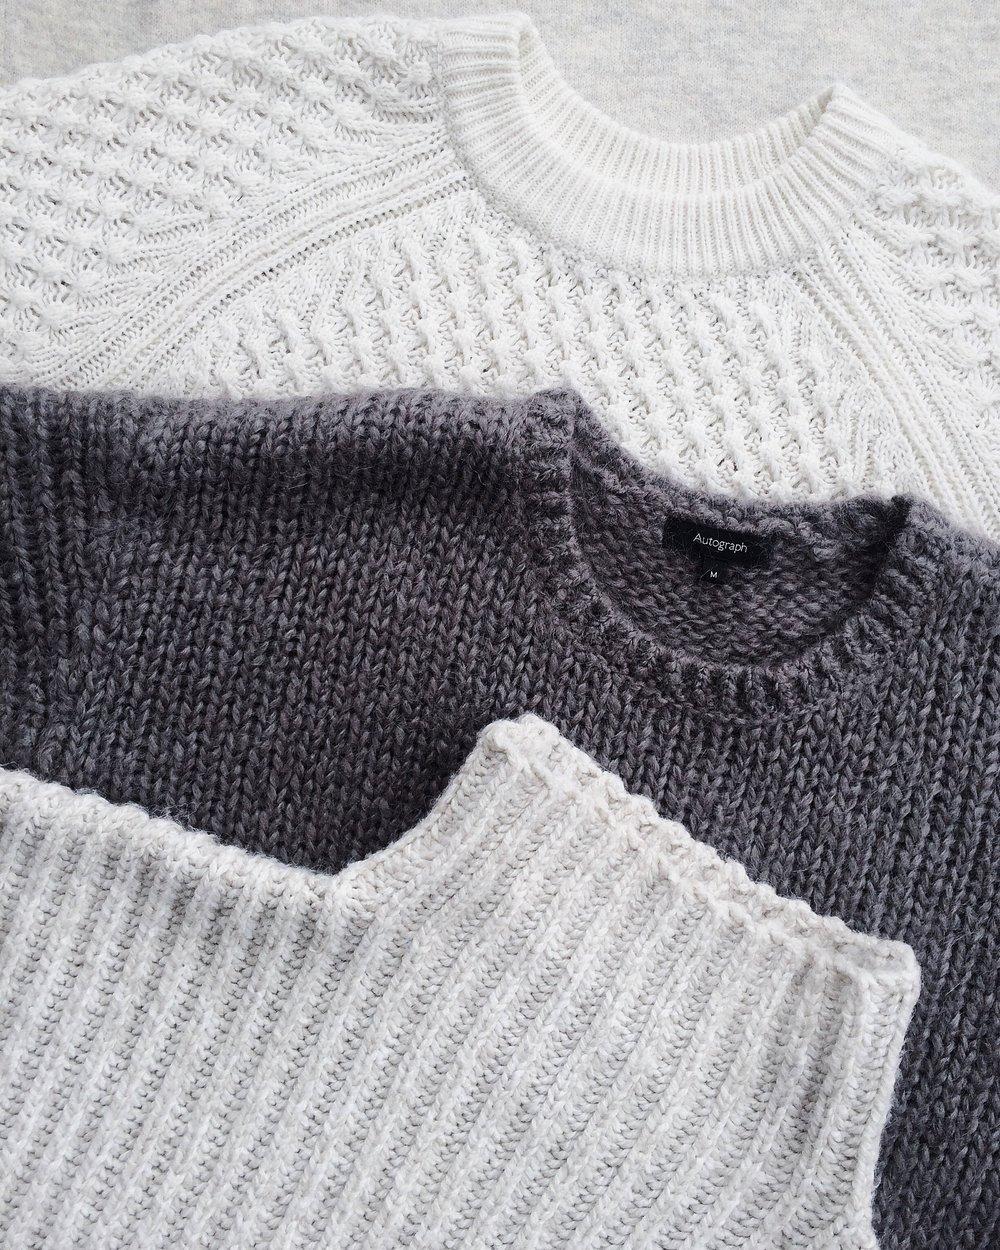 knitwear-manufacturers.jpg